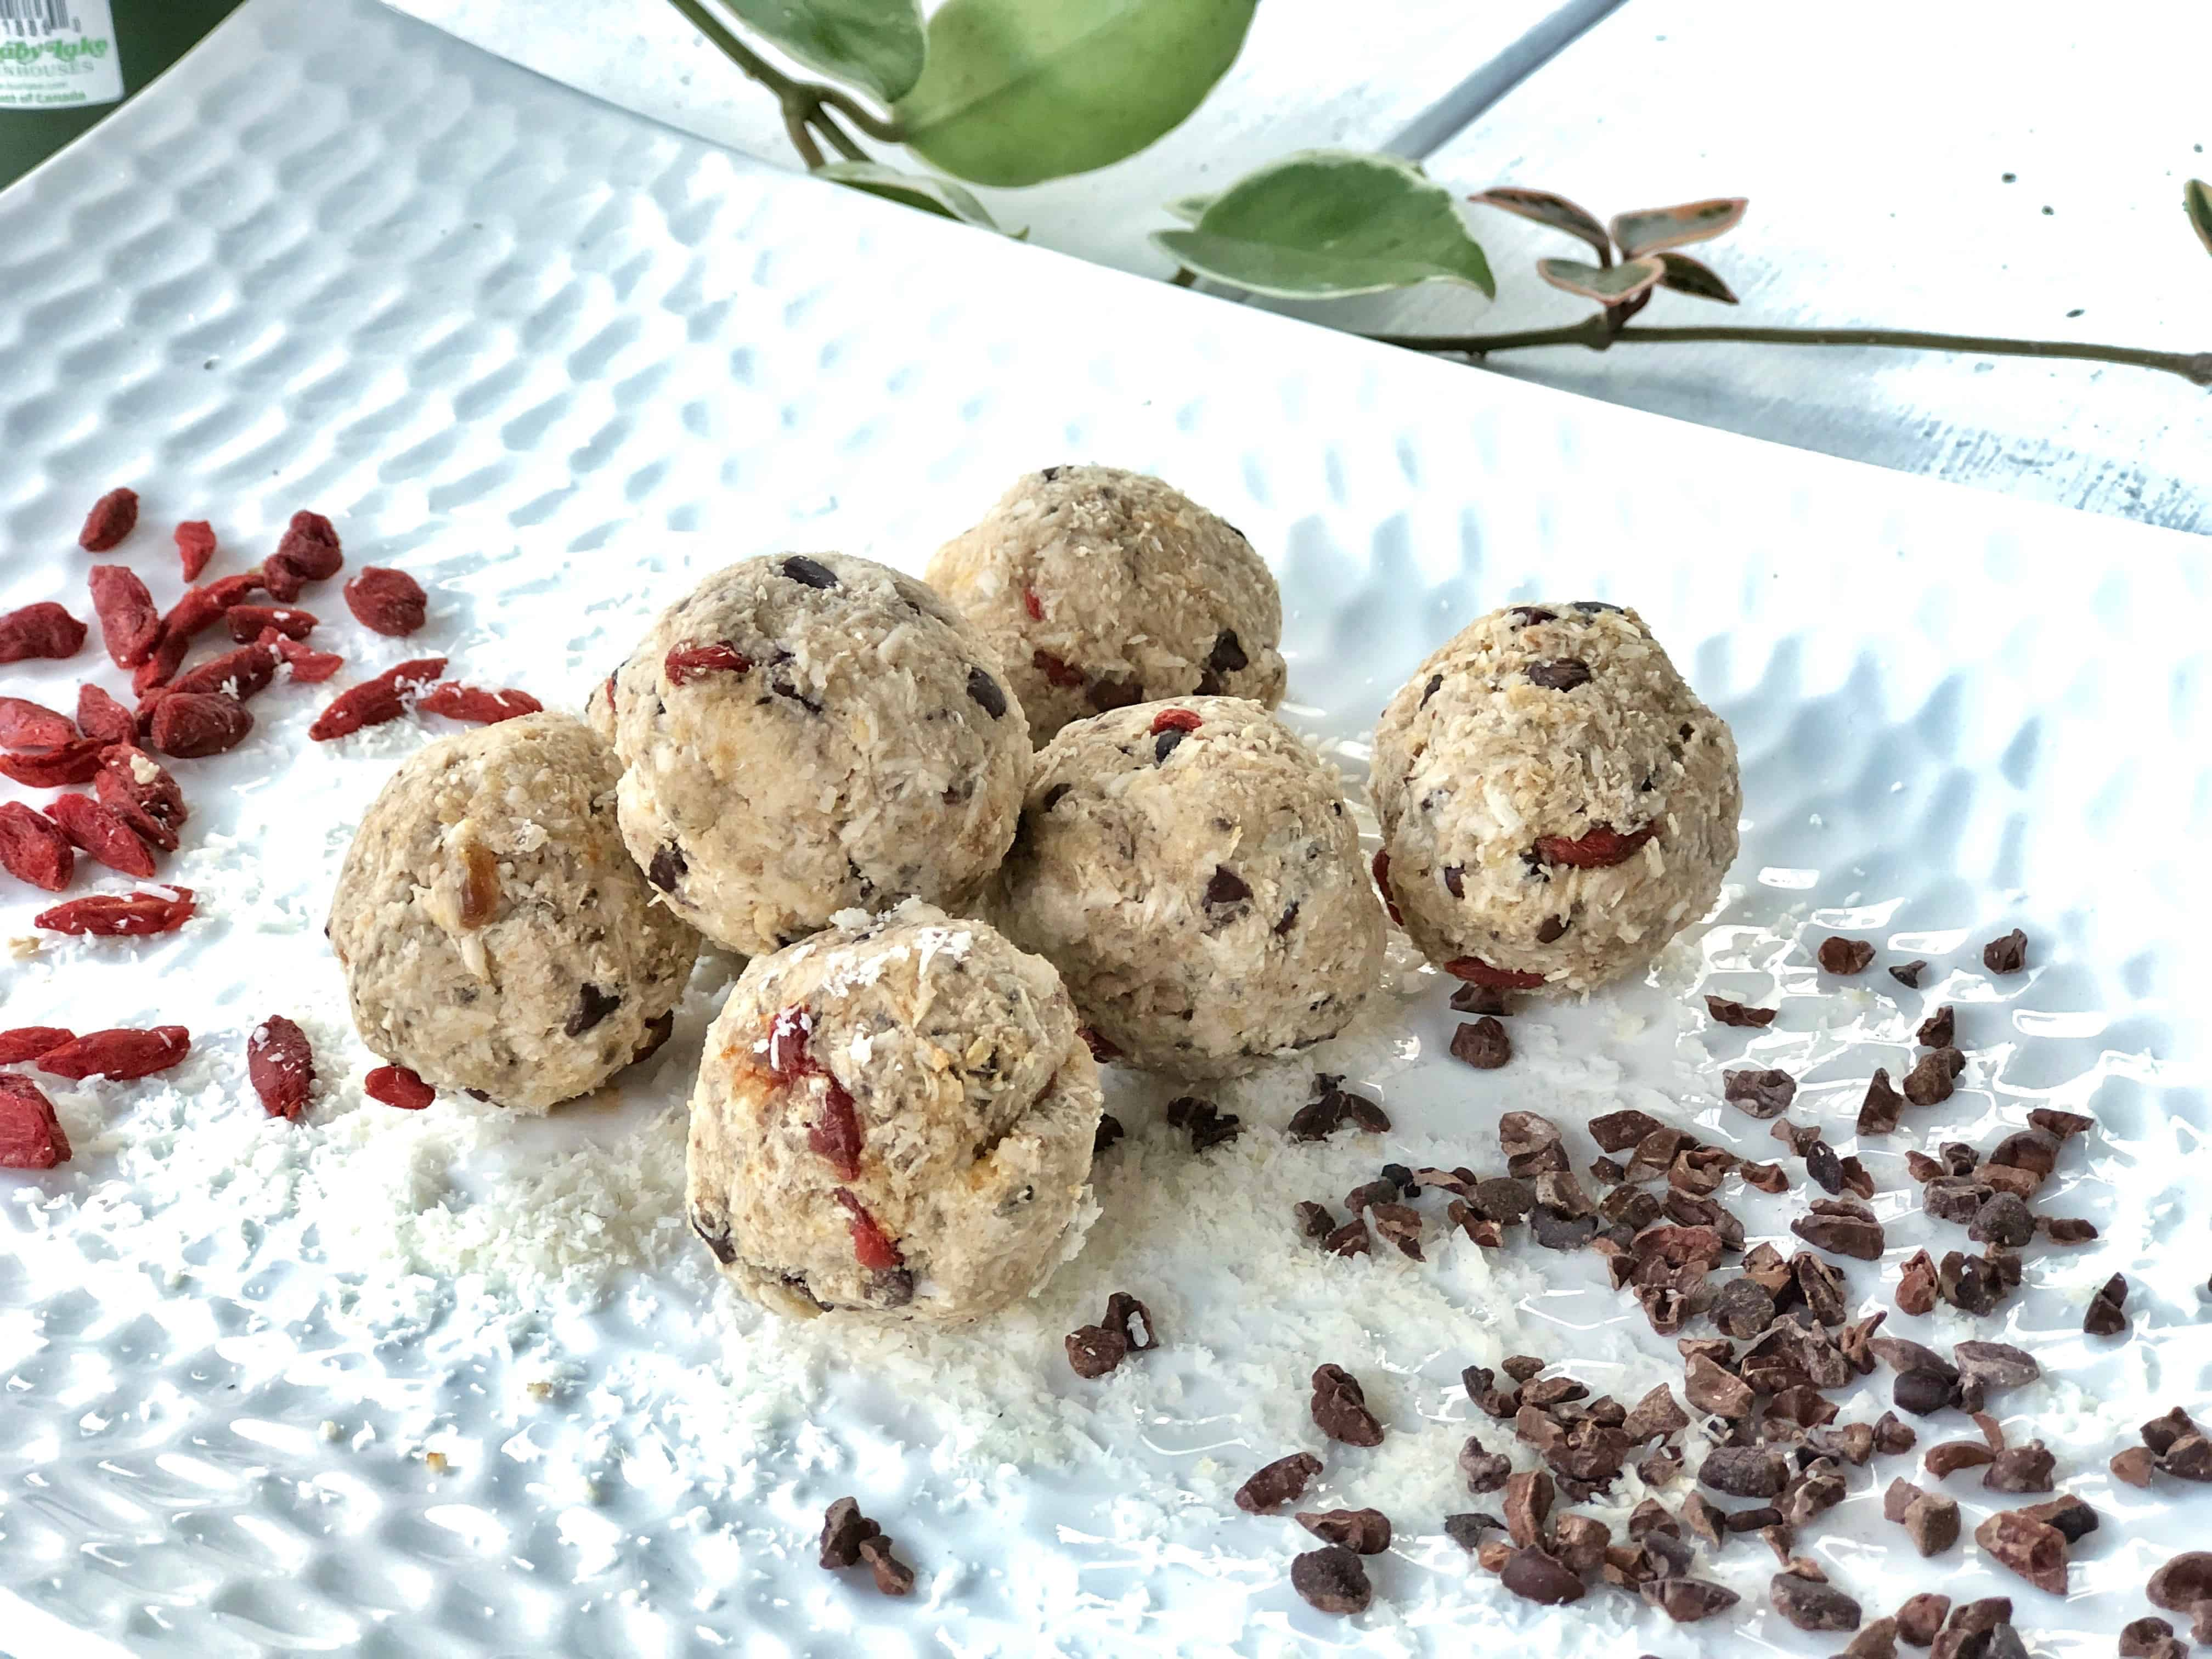 chocolate chip chaga dough balls